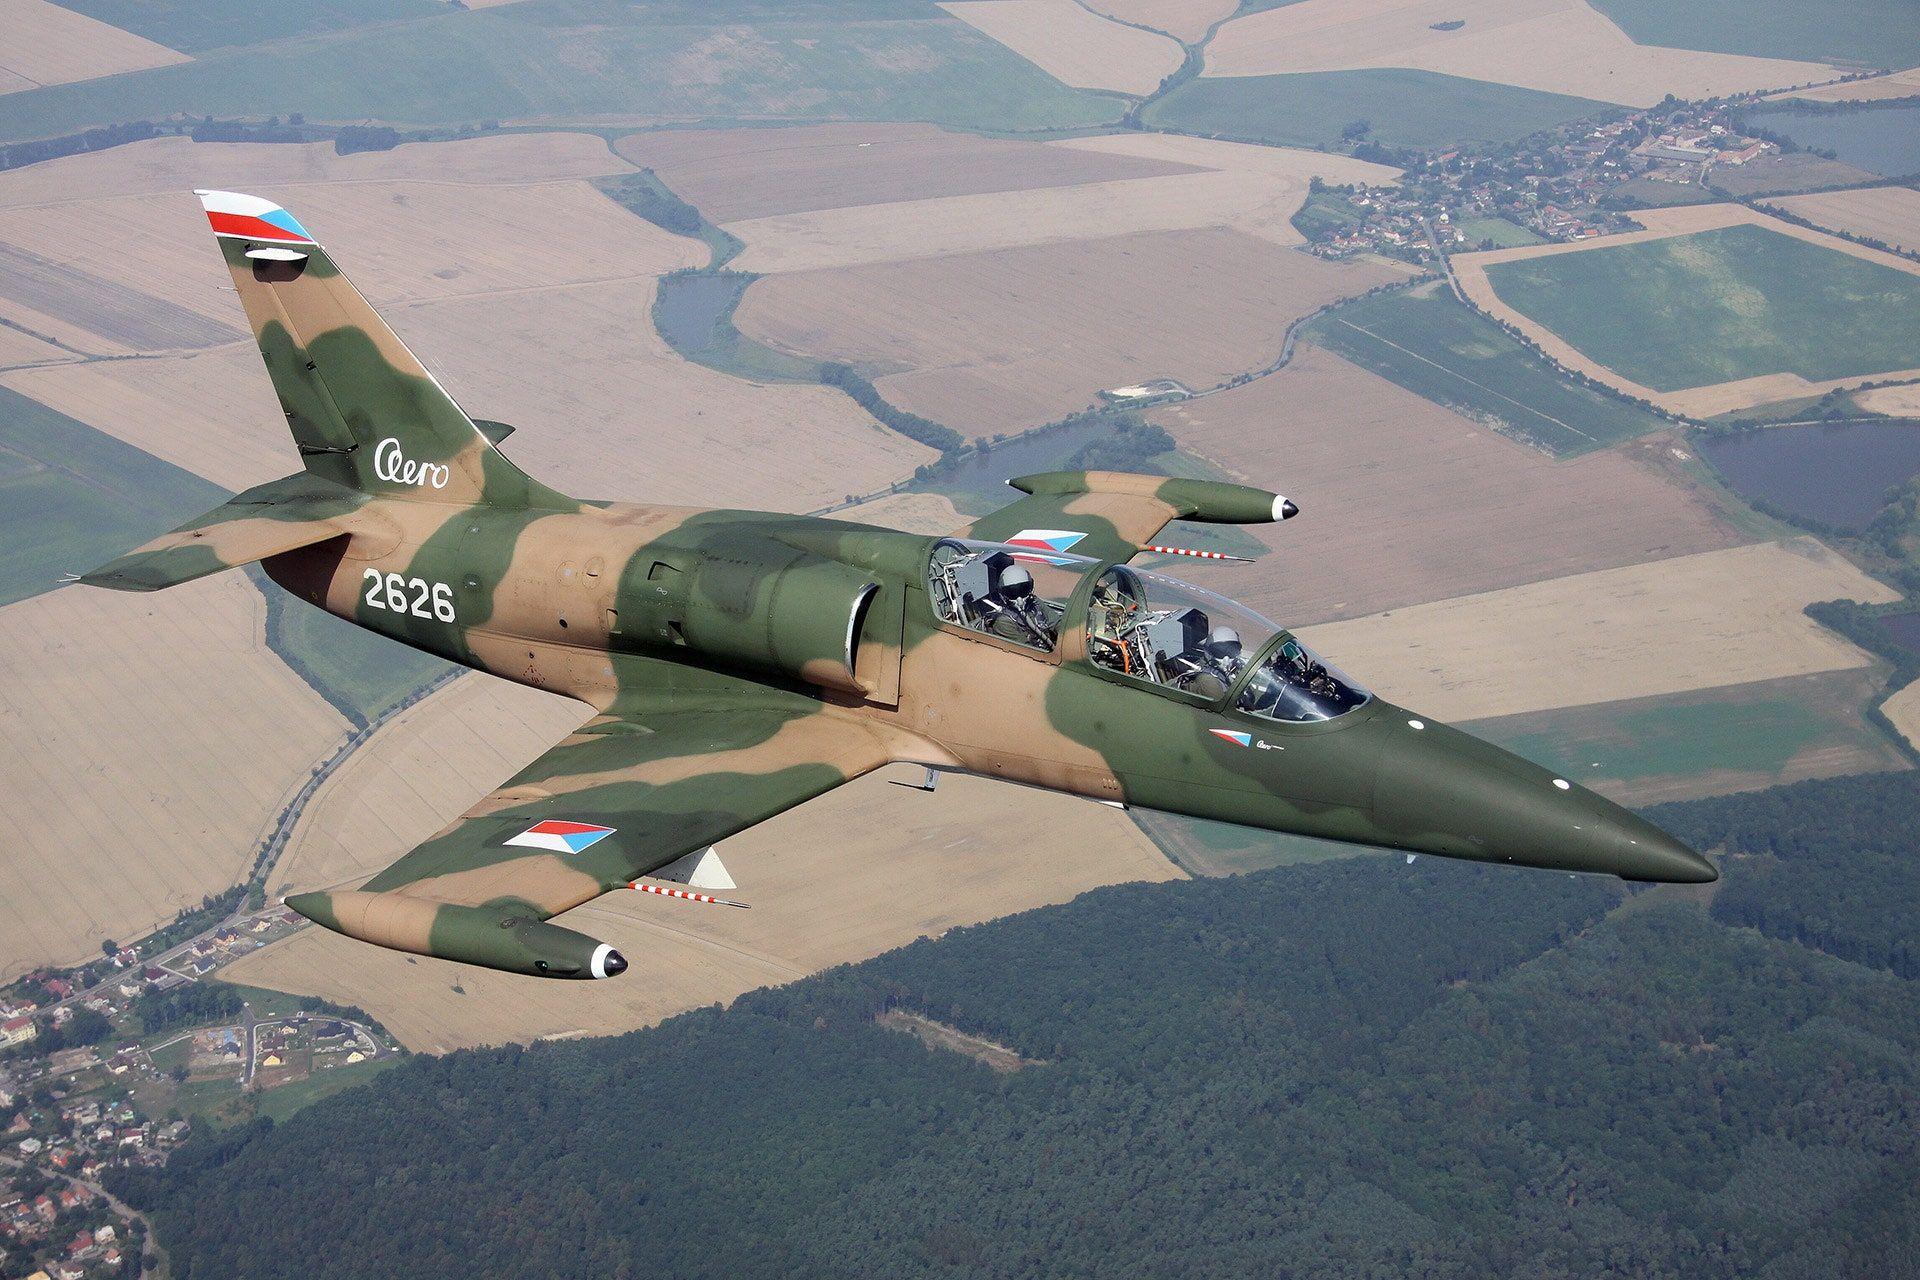 "<img src=""elon-musk-aero.jpg"" alt=""An Aero L-39 Albatros"">"